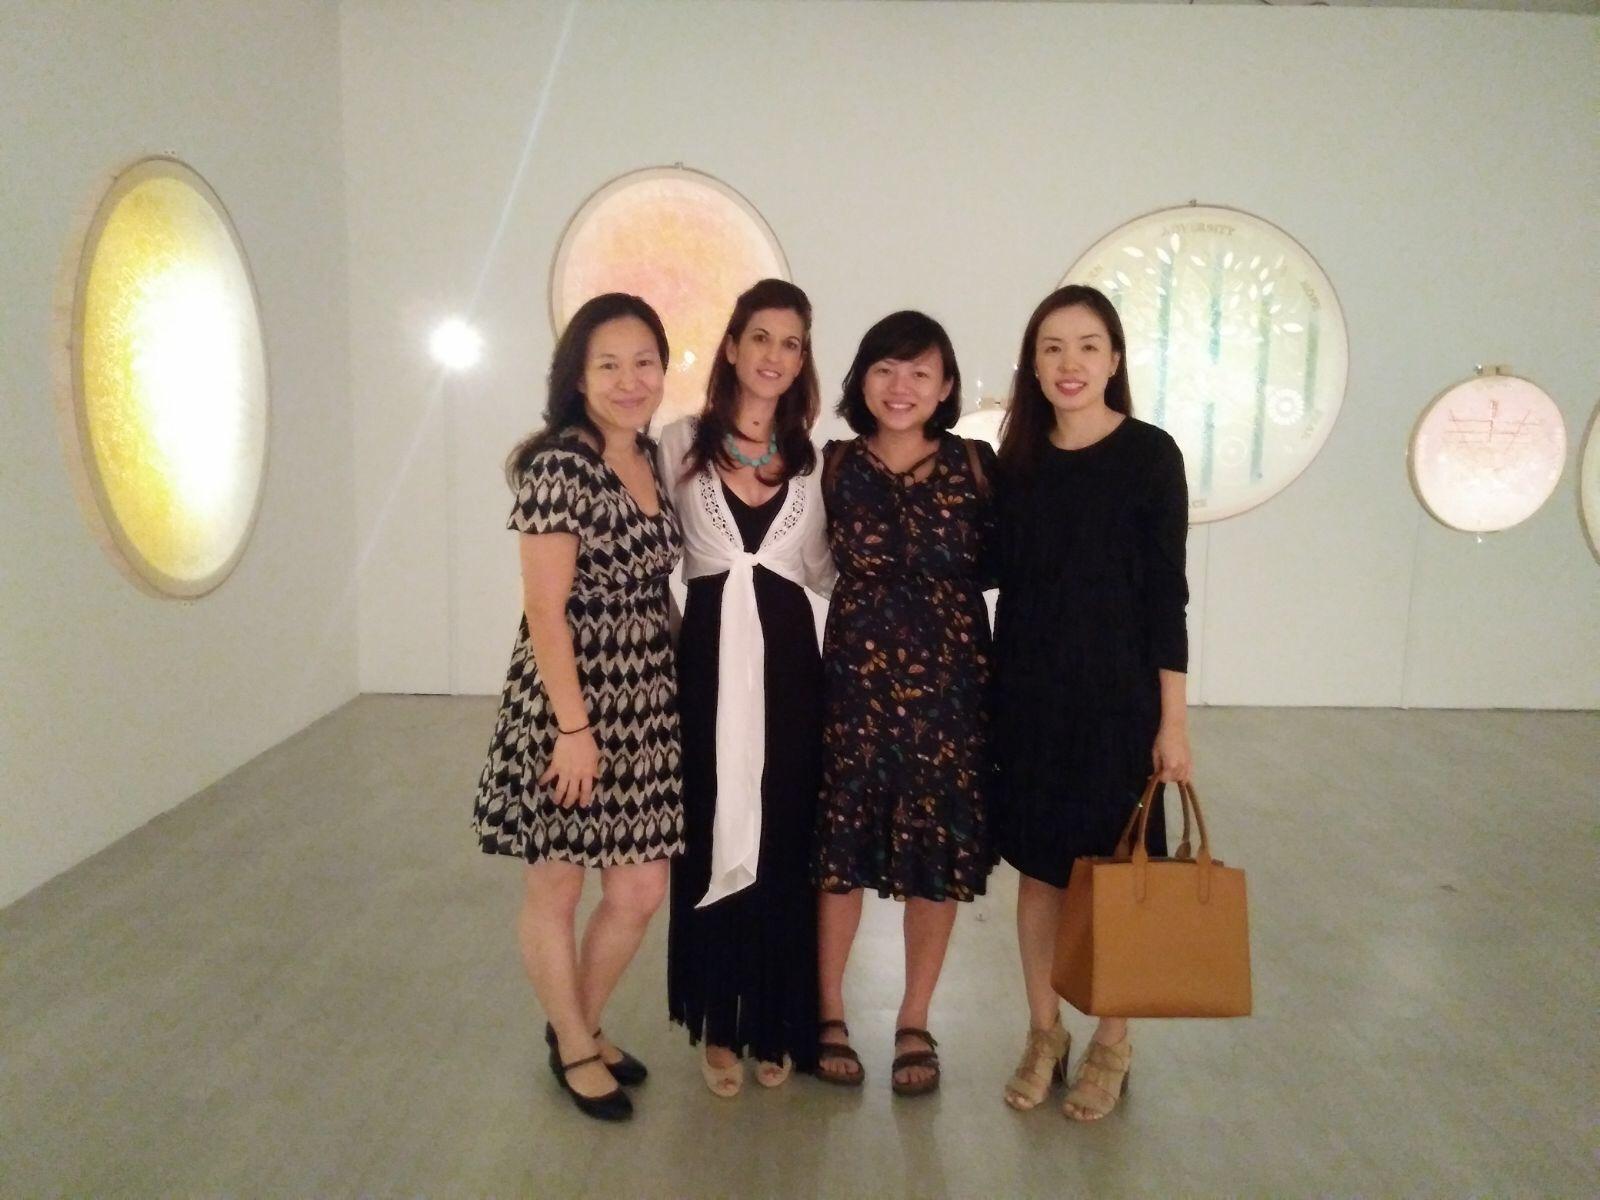 SOLO EXHIBITION OPENING_NICOLA ANTHONY_SINGAPORE ART MUSEUM 1.JPG